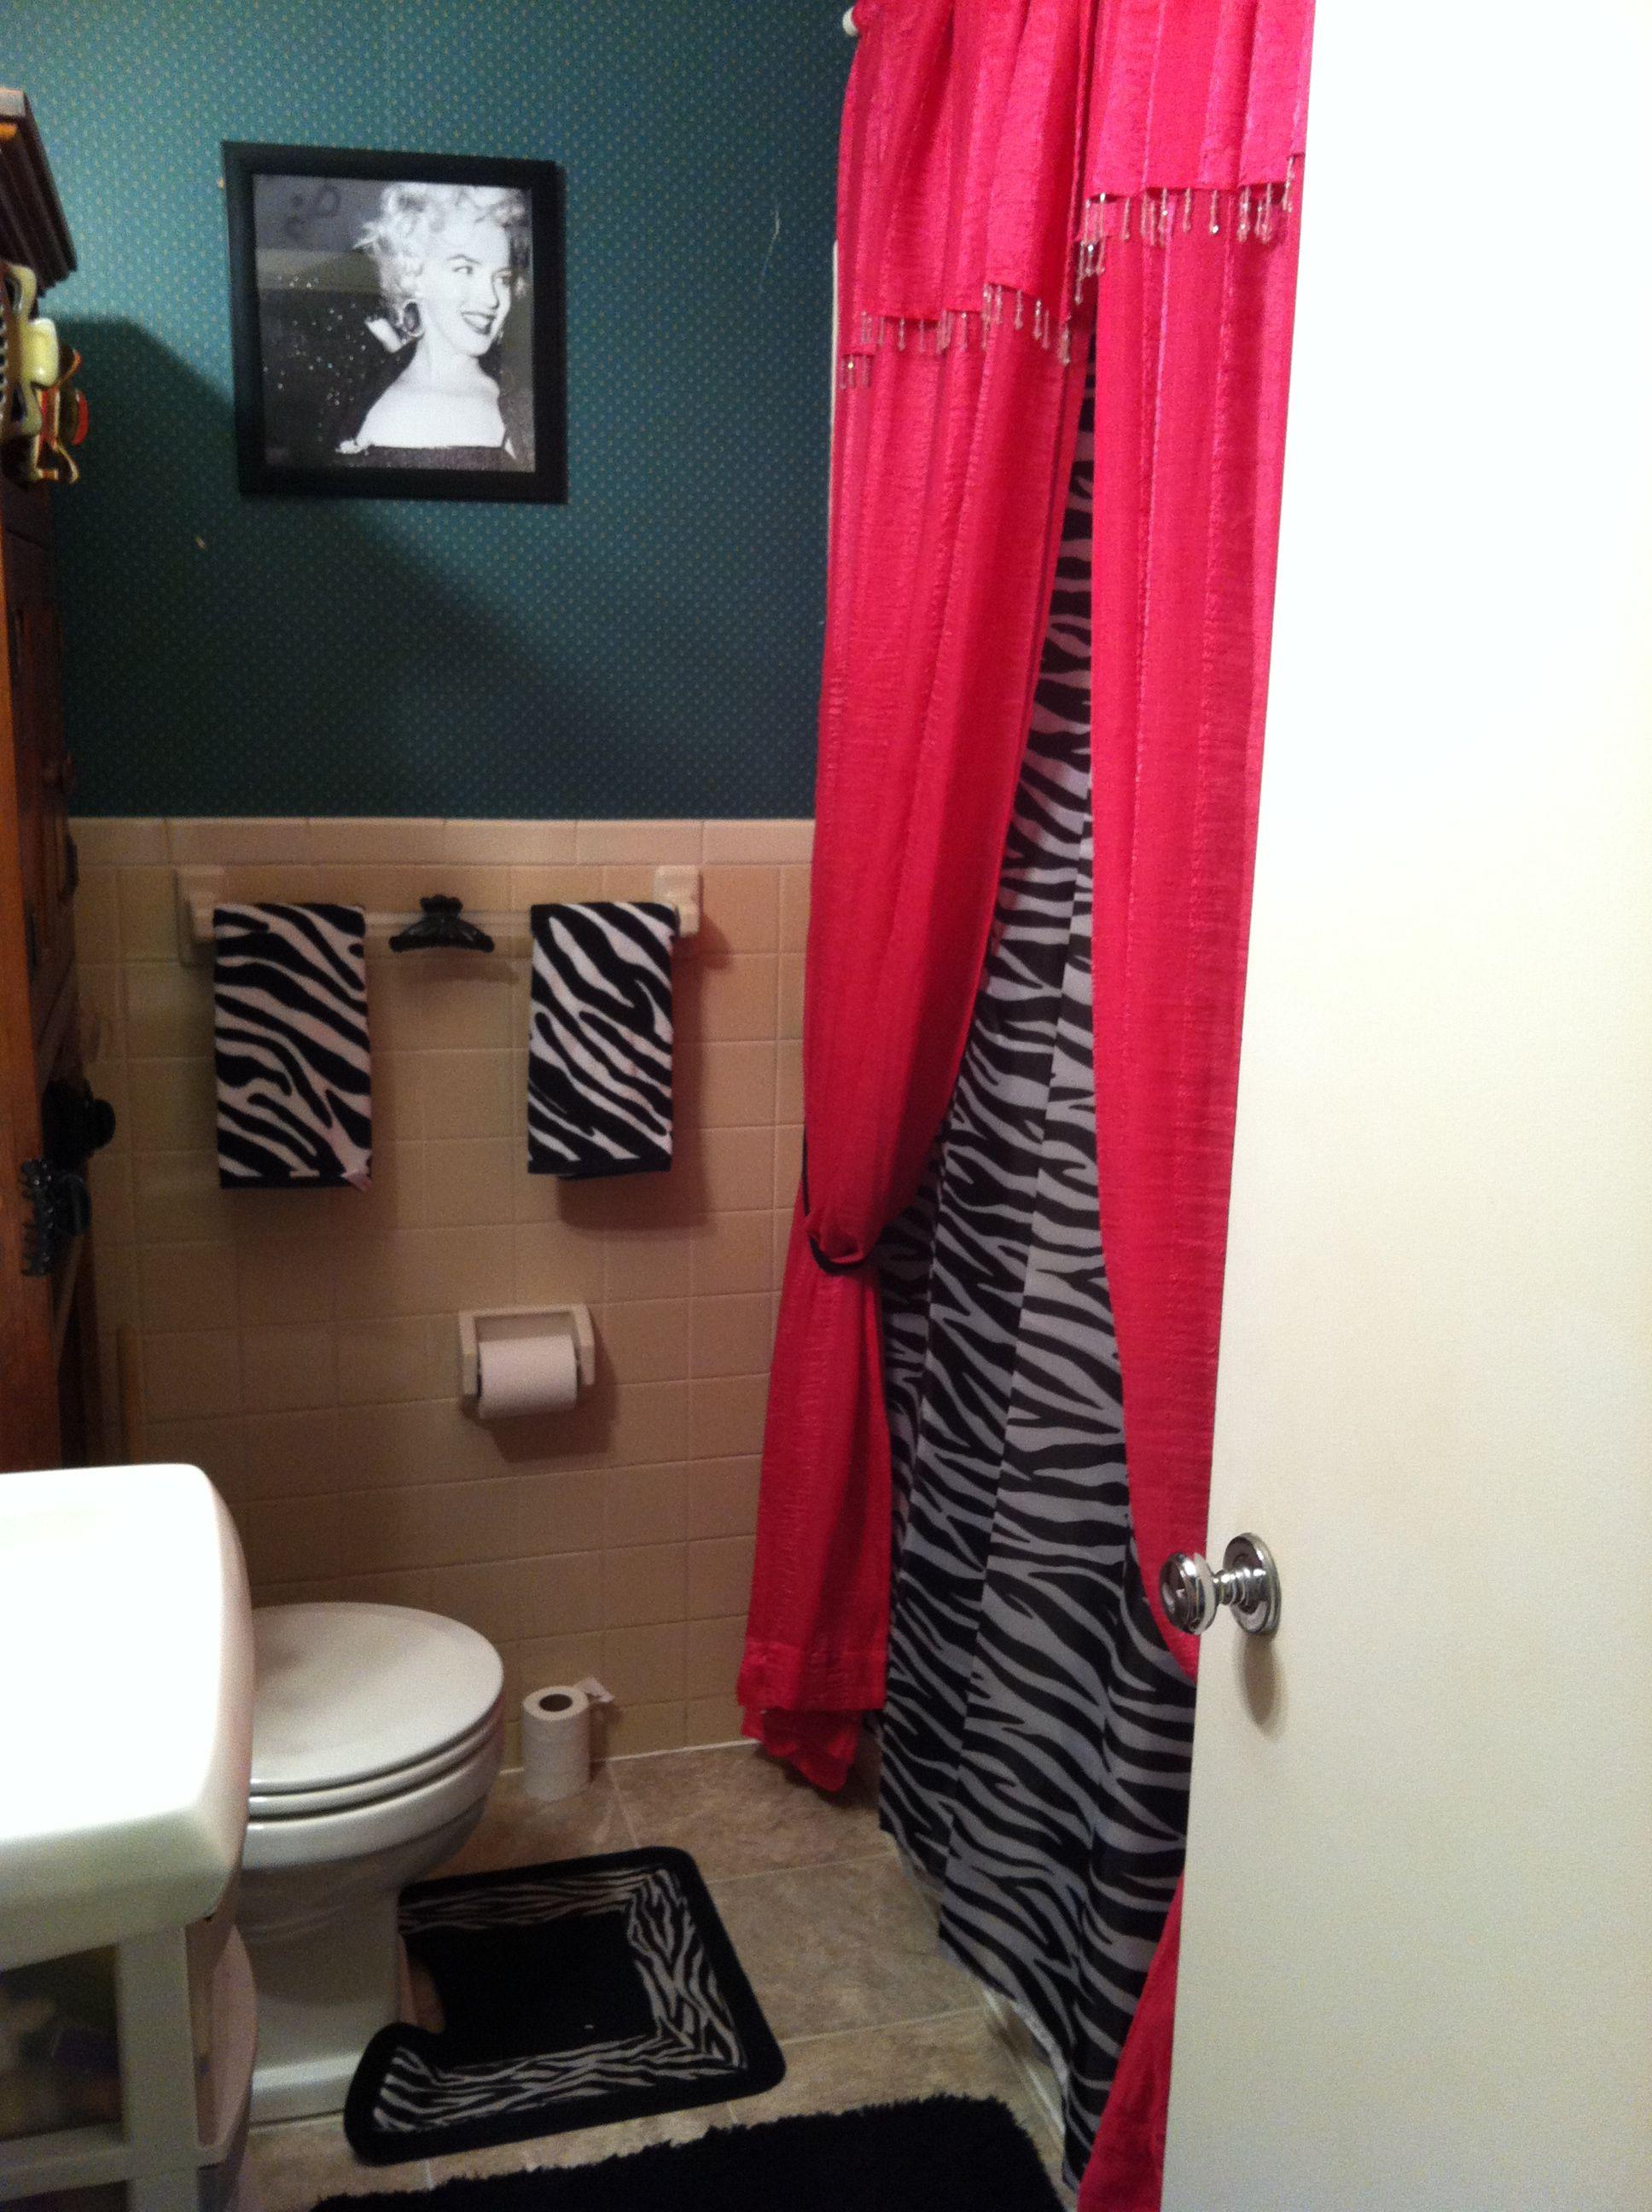 Megans Bathroom Cute Pink And Zebra Bathroom Zebra Bathroom Zebra Print Bathroom Zebra Bathroom Decor Pink zebra bathroom decor